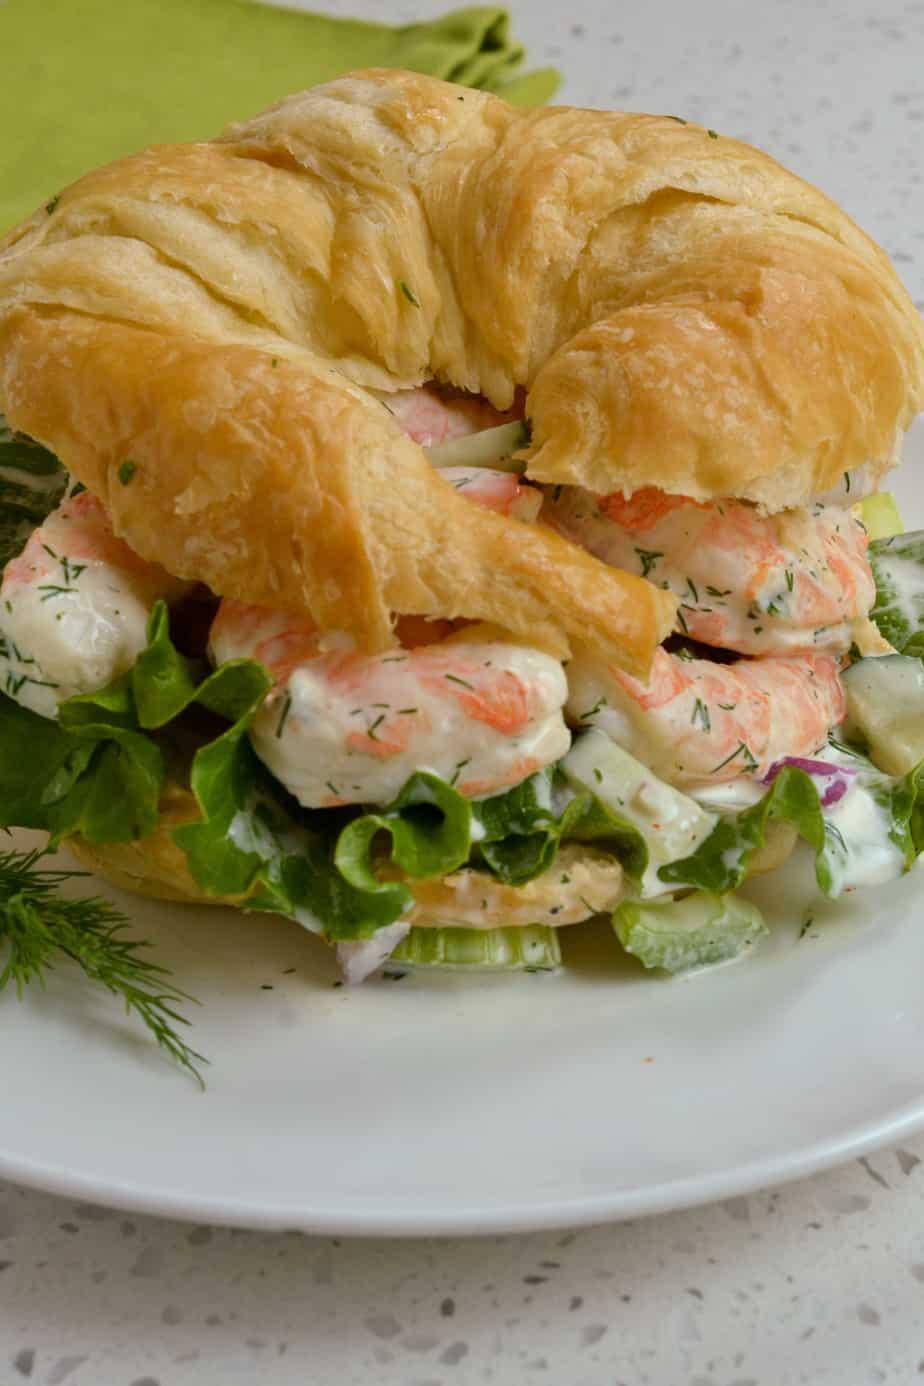 Shrimp salad on buttery croissant.